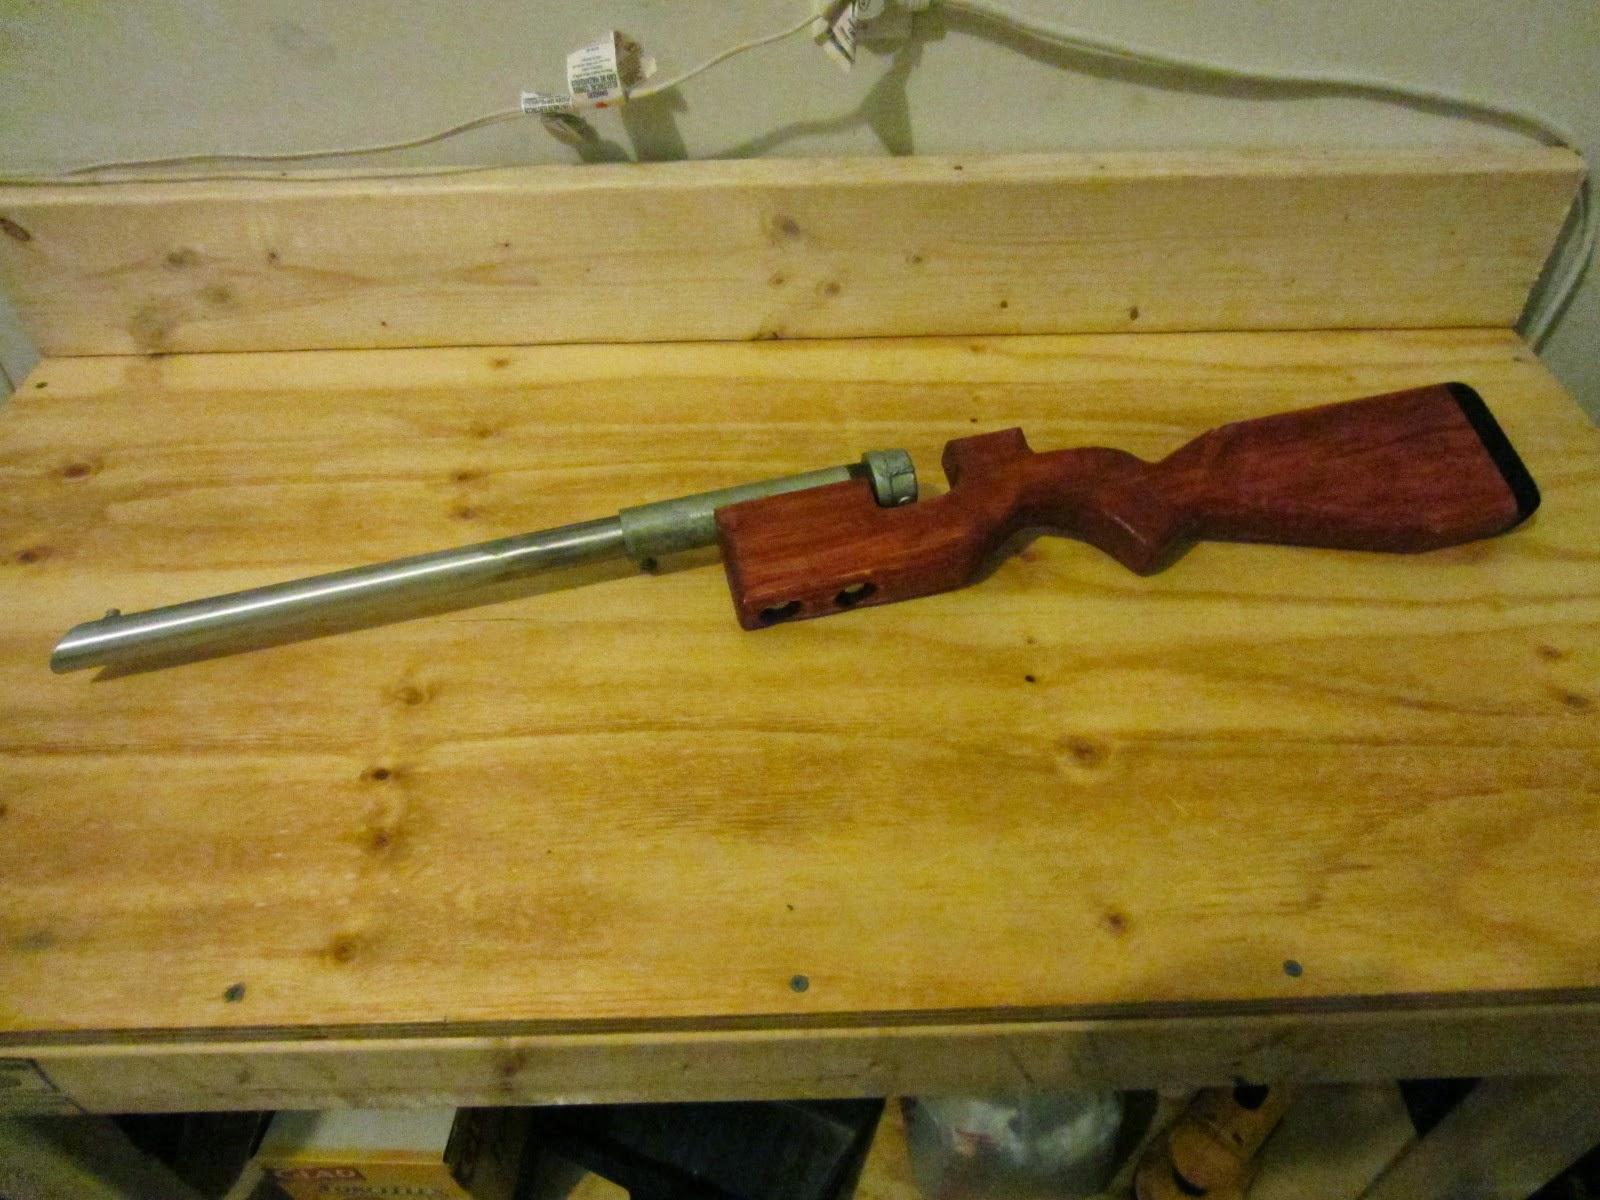 Homemade 12 Gauge Pipe Shotgun From Mind To Machine